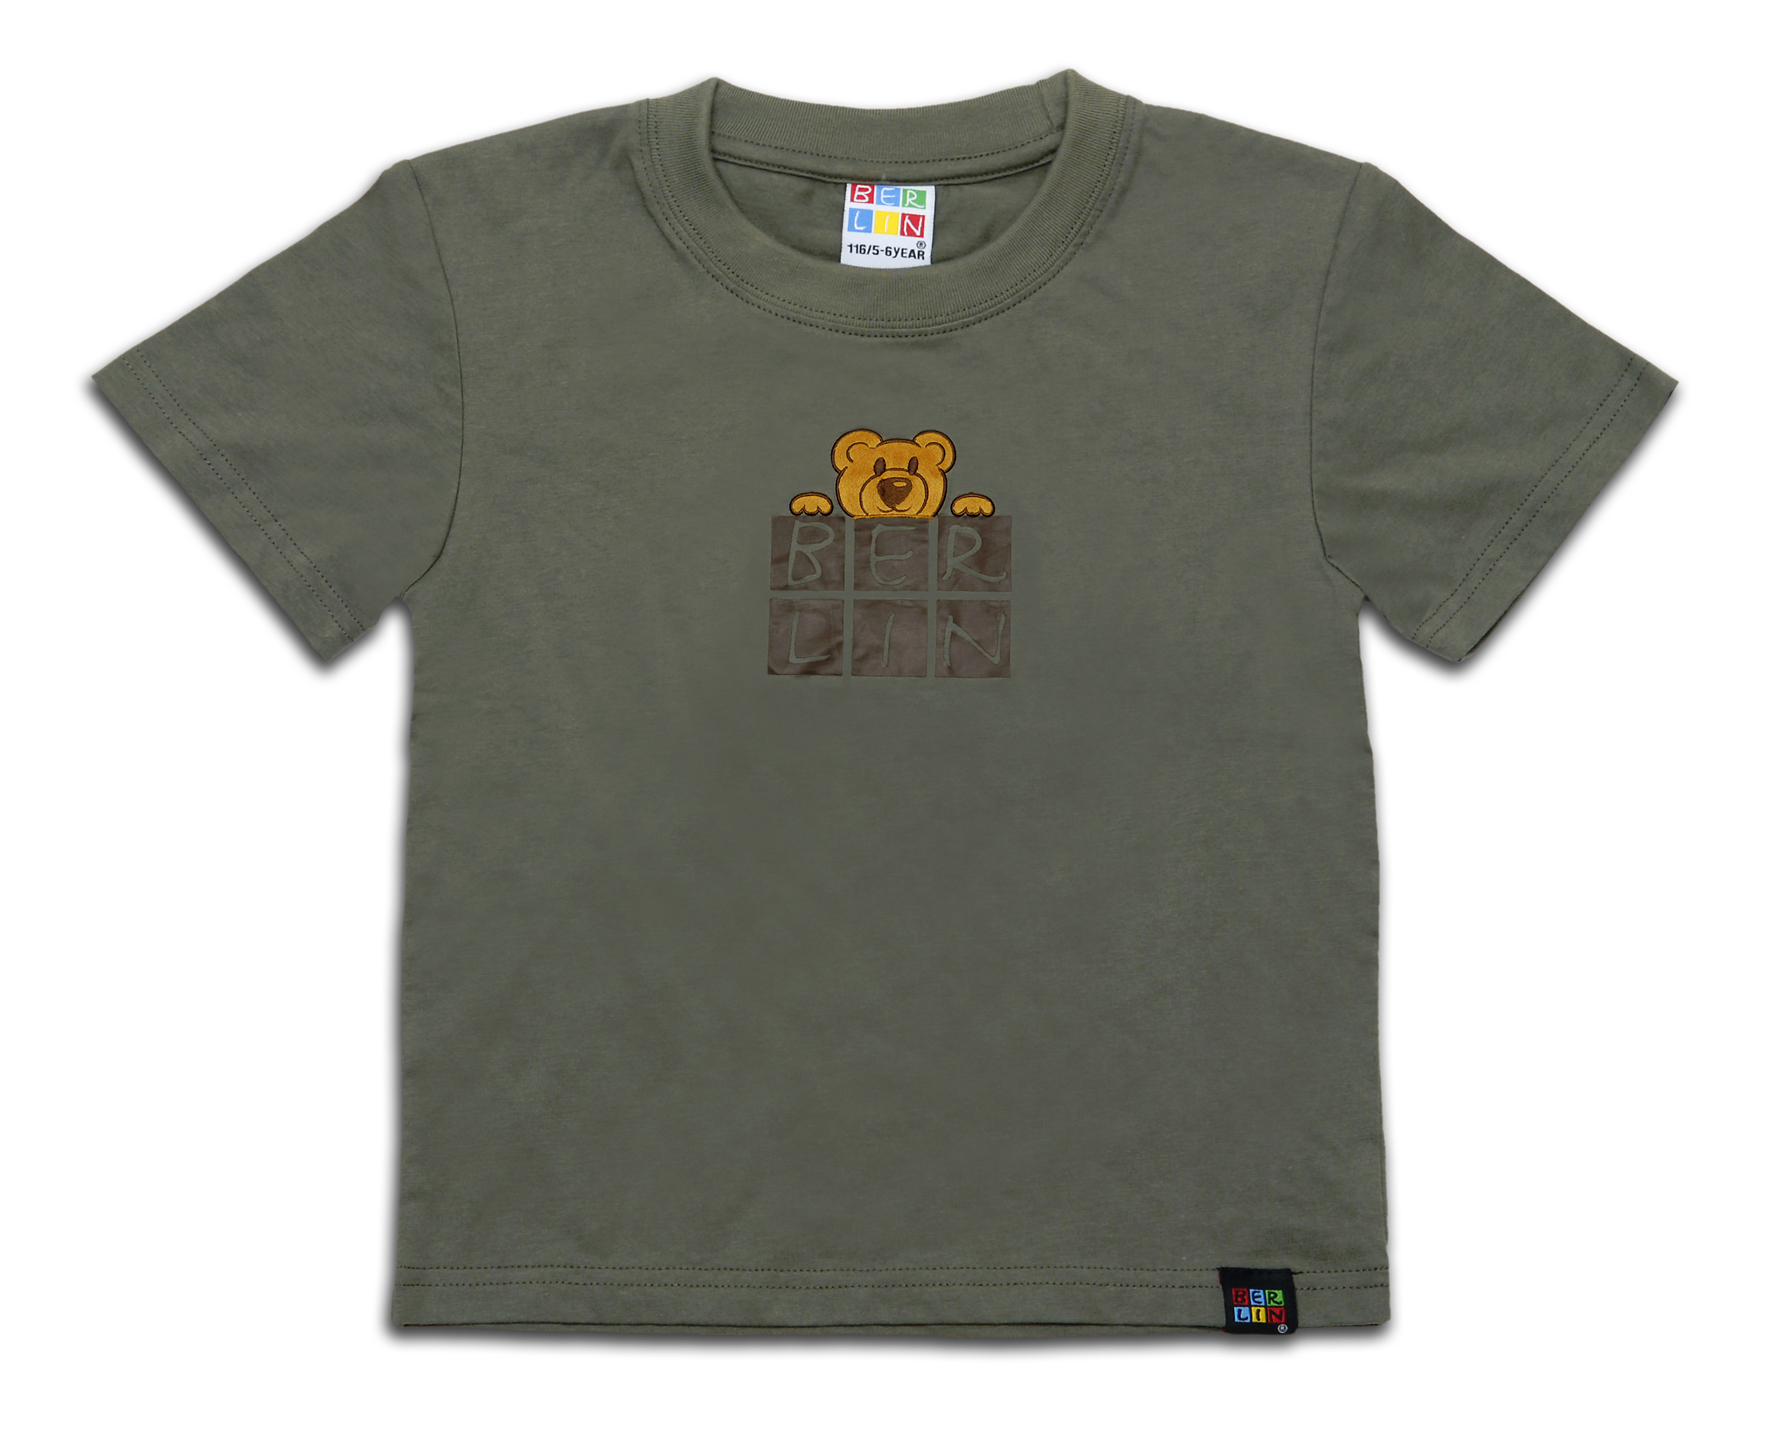 010-1532 Kids T-Shirt BERLIN Bärchen oliv